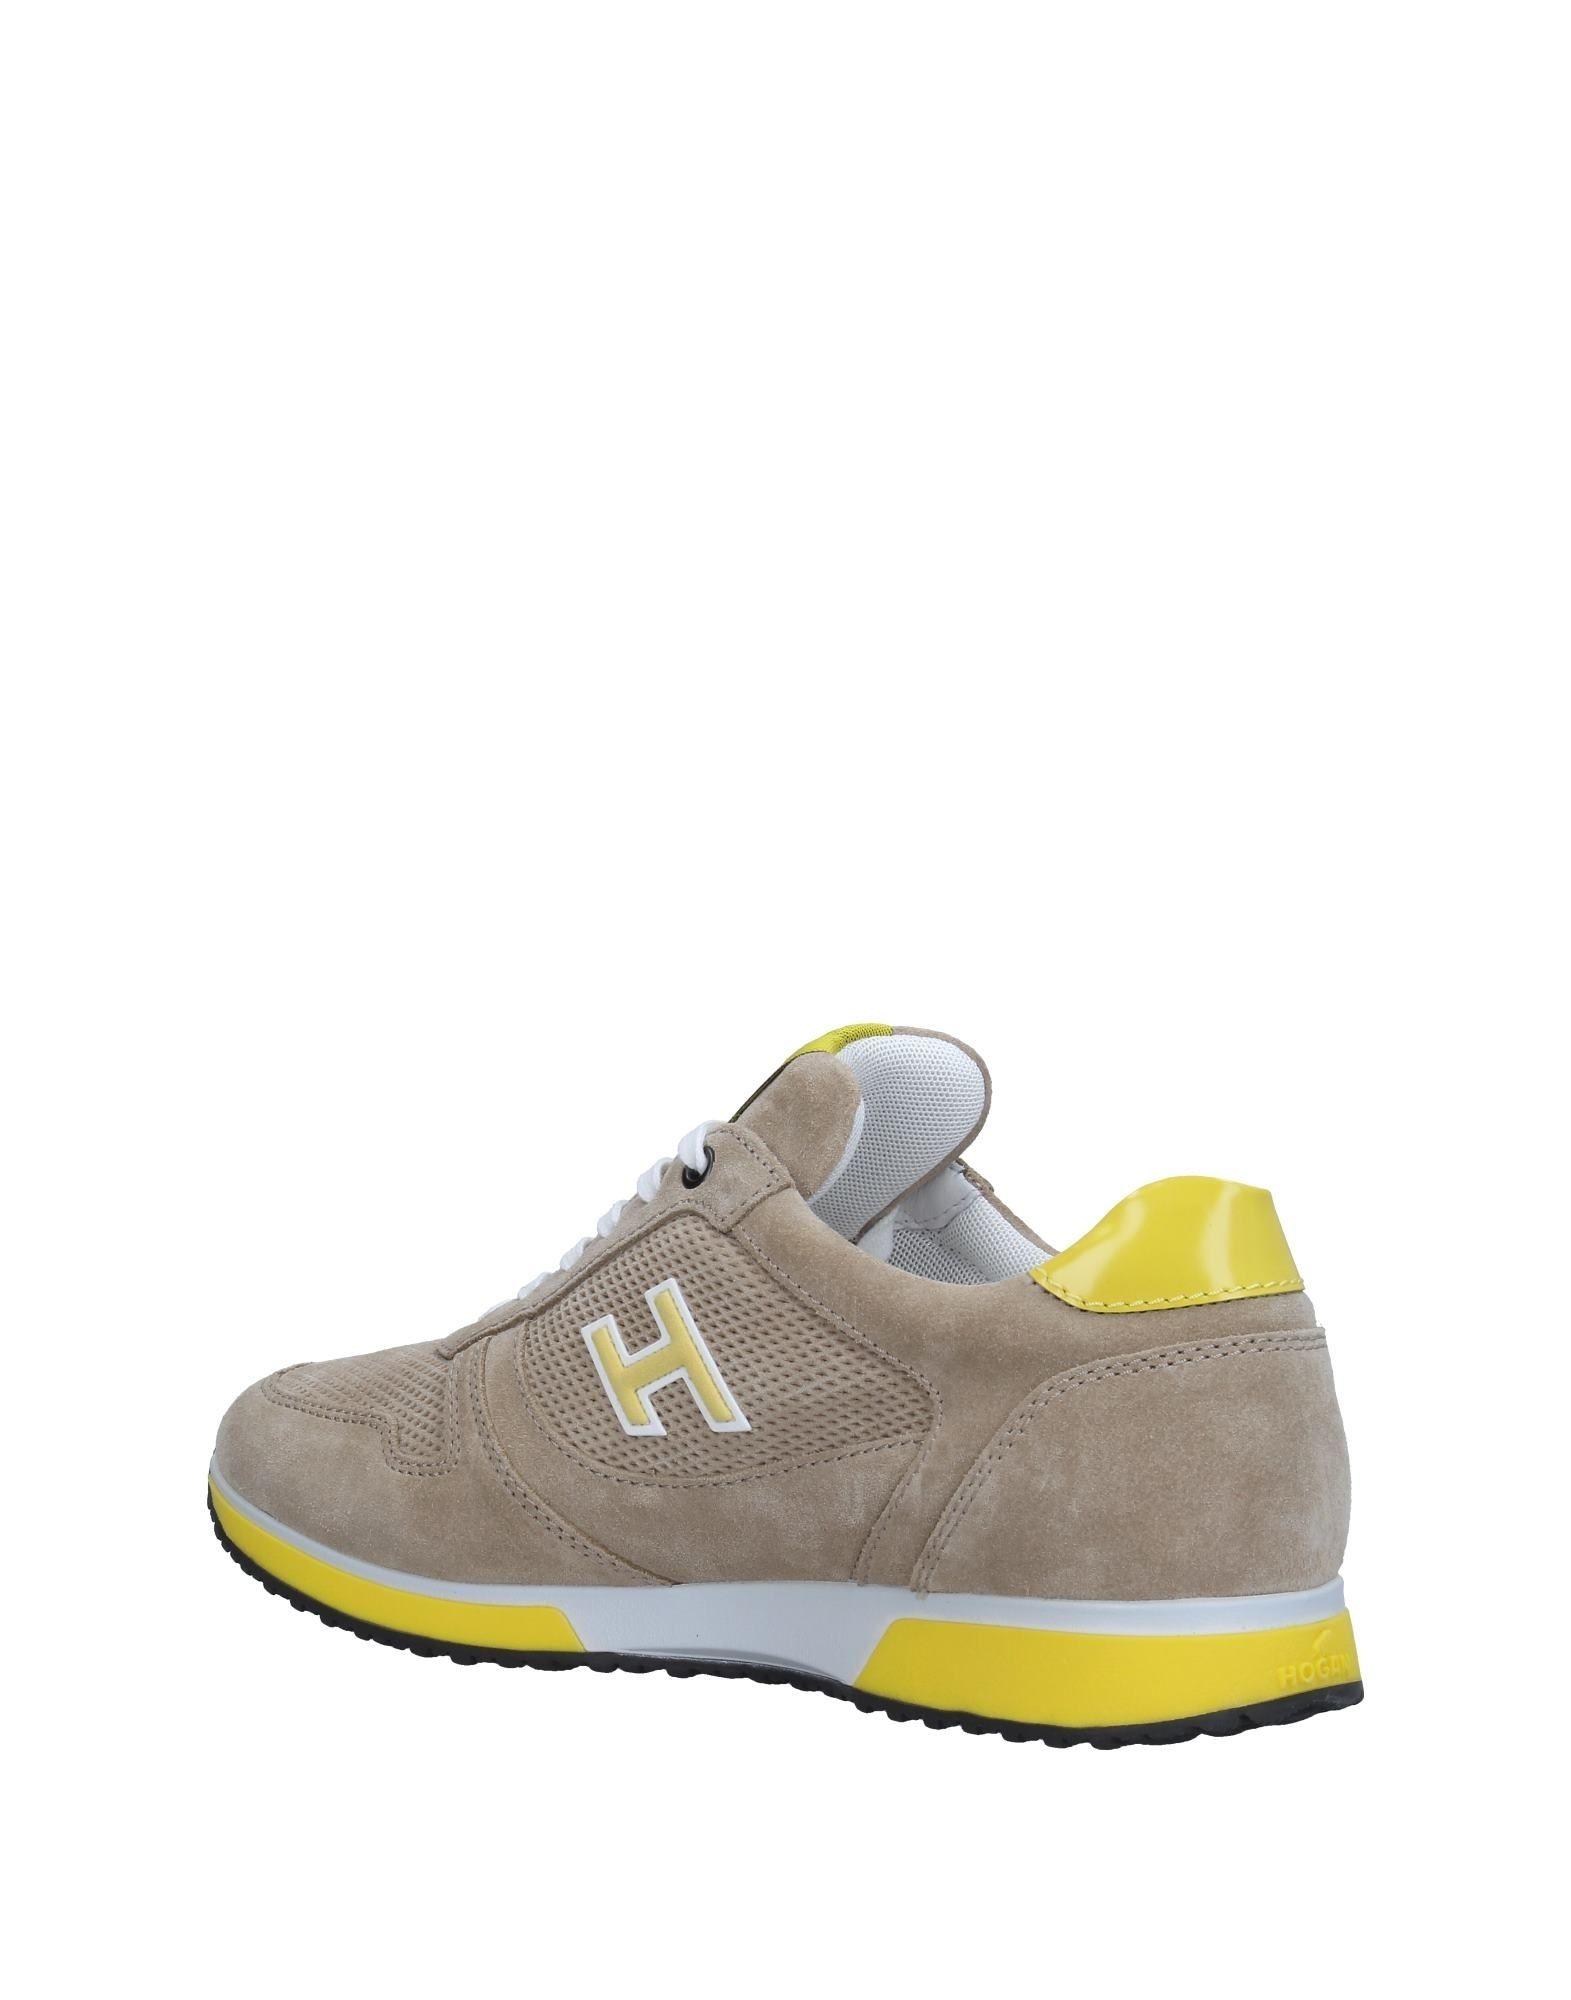 Moda Sneakers Hogan Hogan Hogan Uomo - 11292204IK 60d6ac